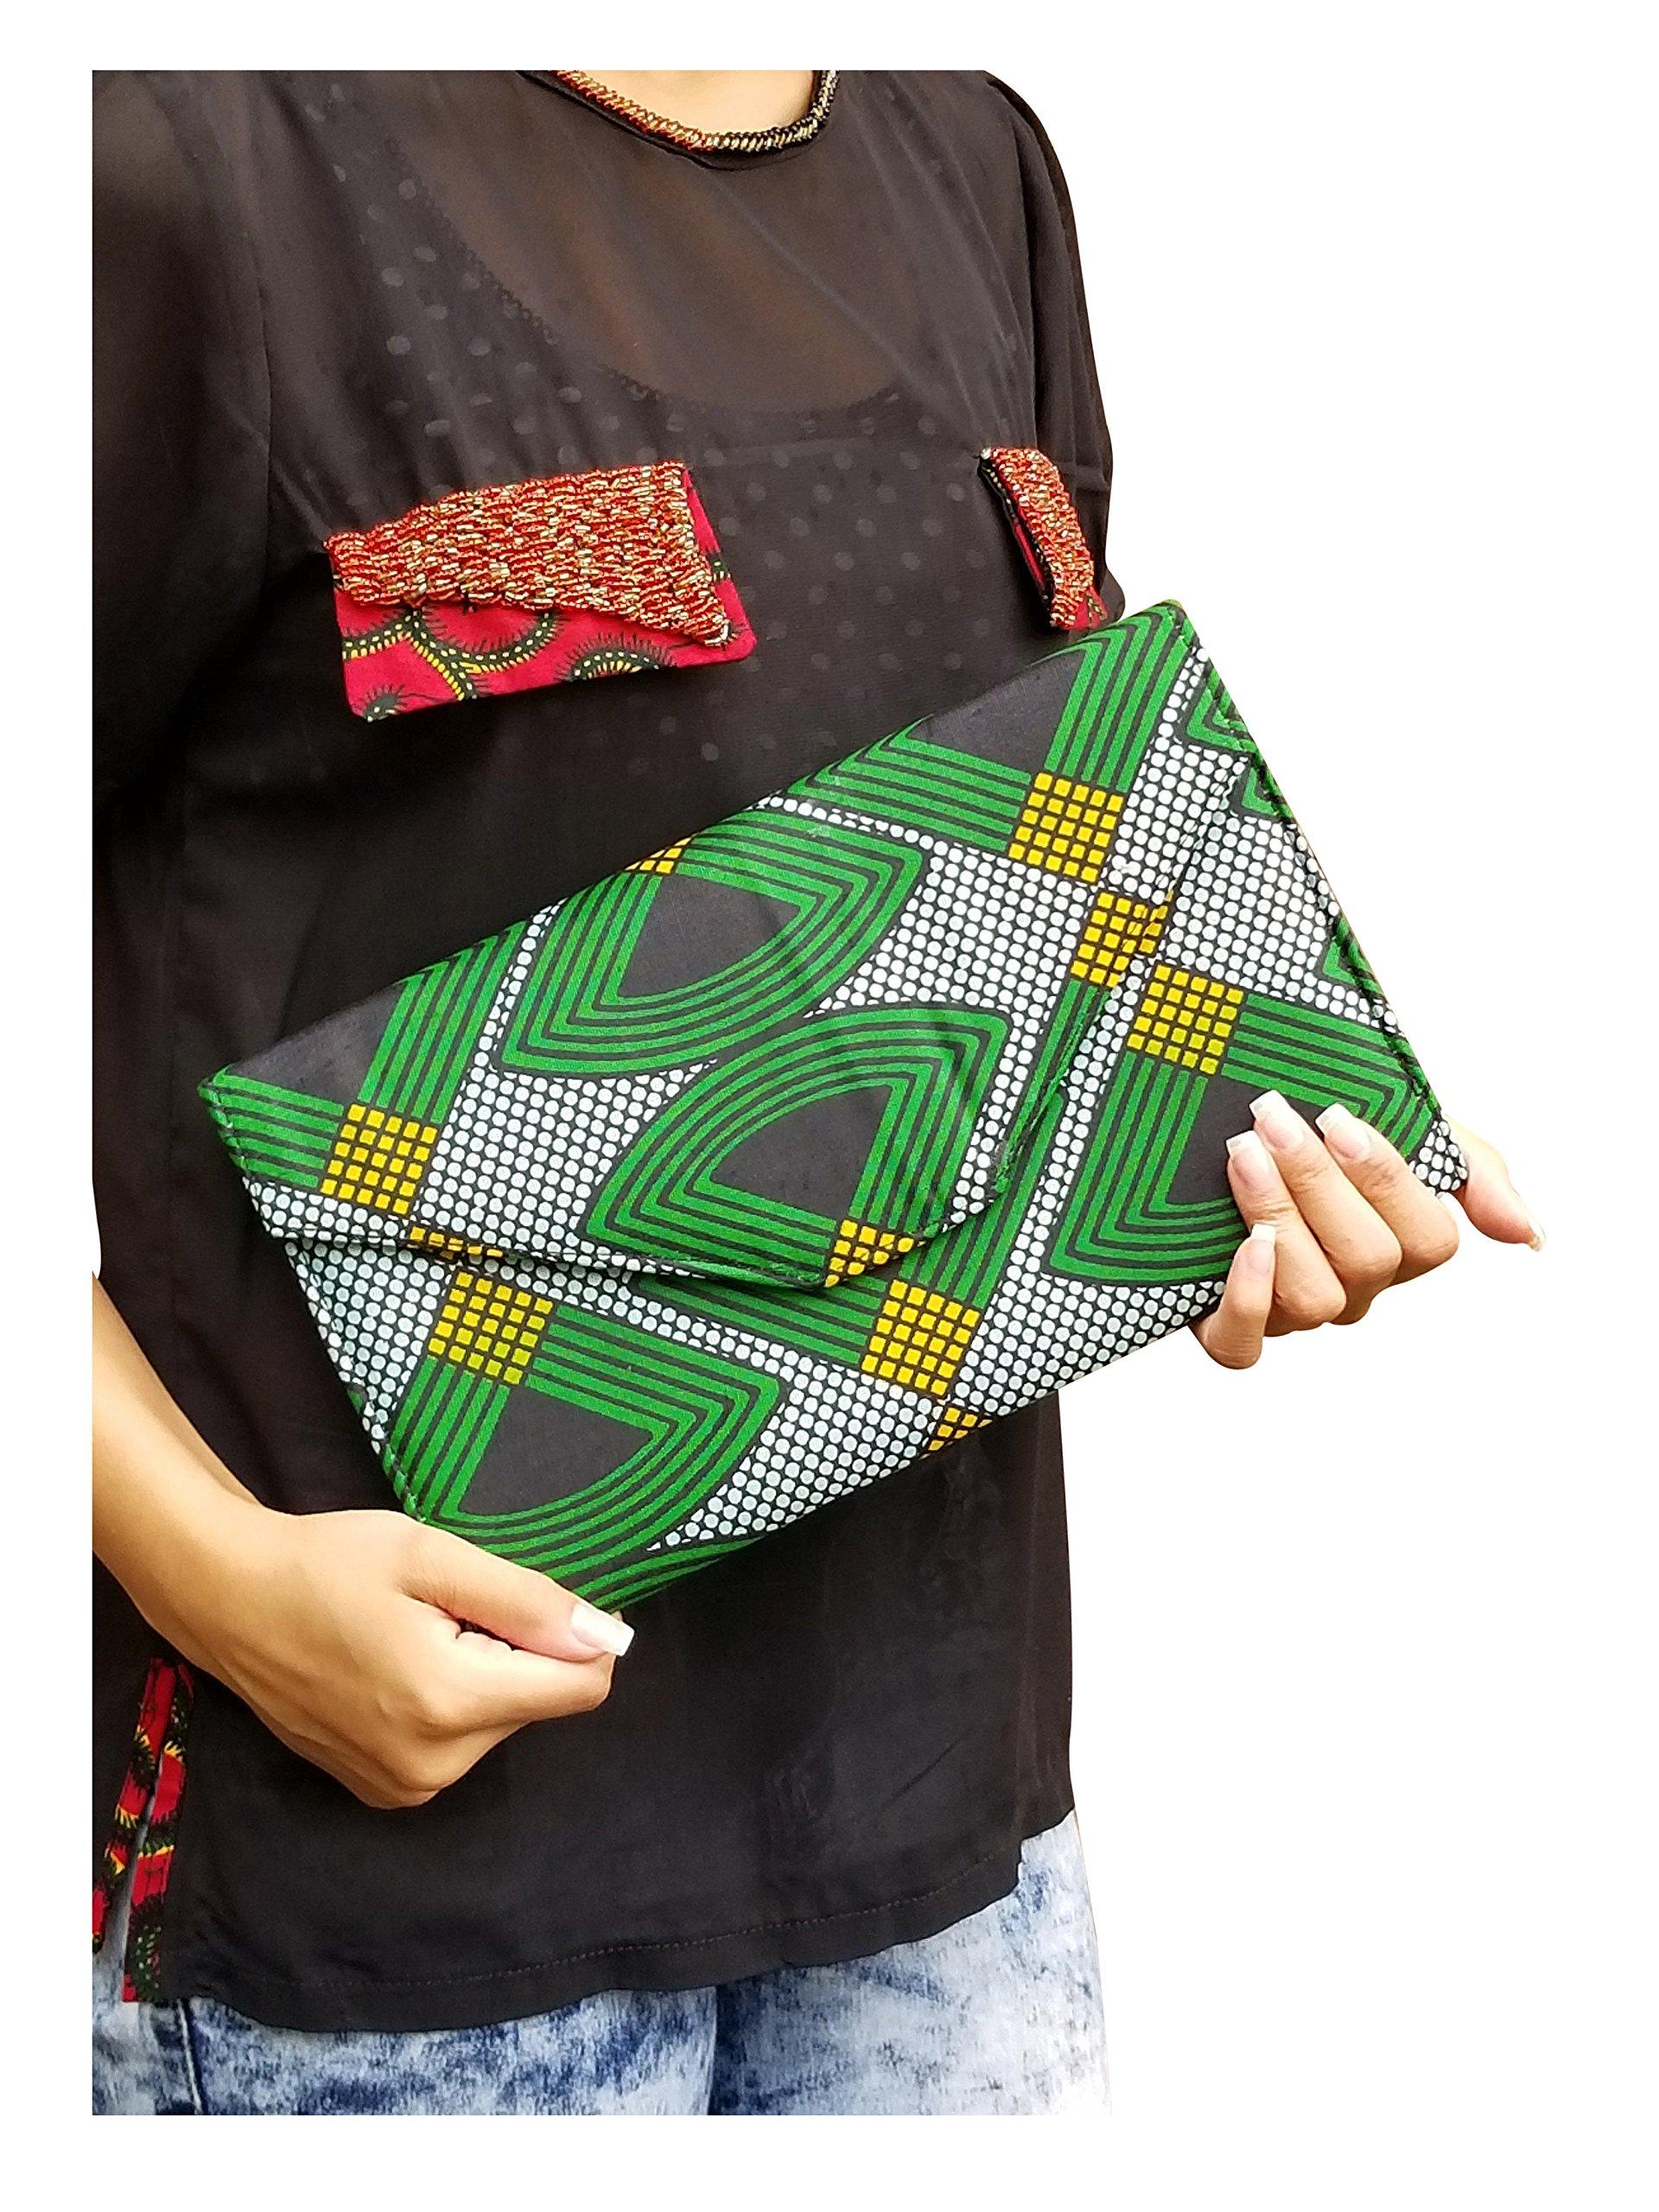 Green, Black African Print Clutch Purse